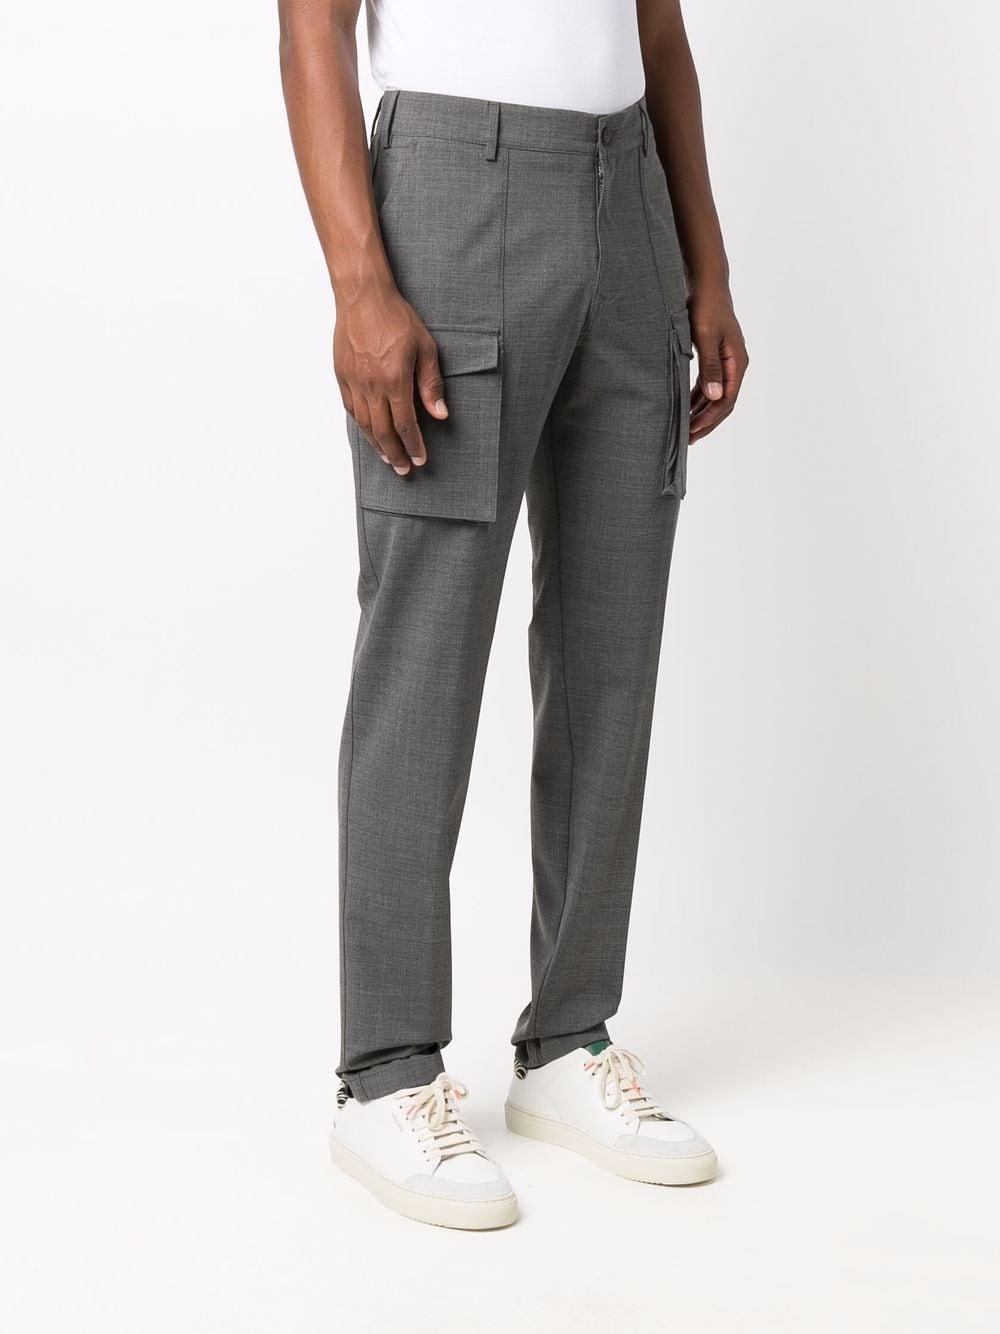 Pantaloni a gamba dritta in lana vergine con piega stirata ELEVENTY | Pantaloni | D75PAND01-TES0A05314